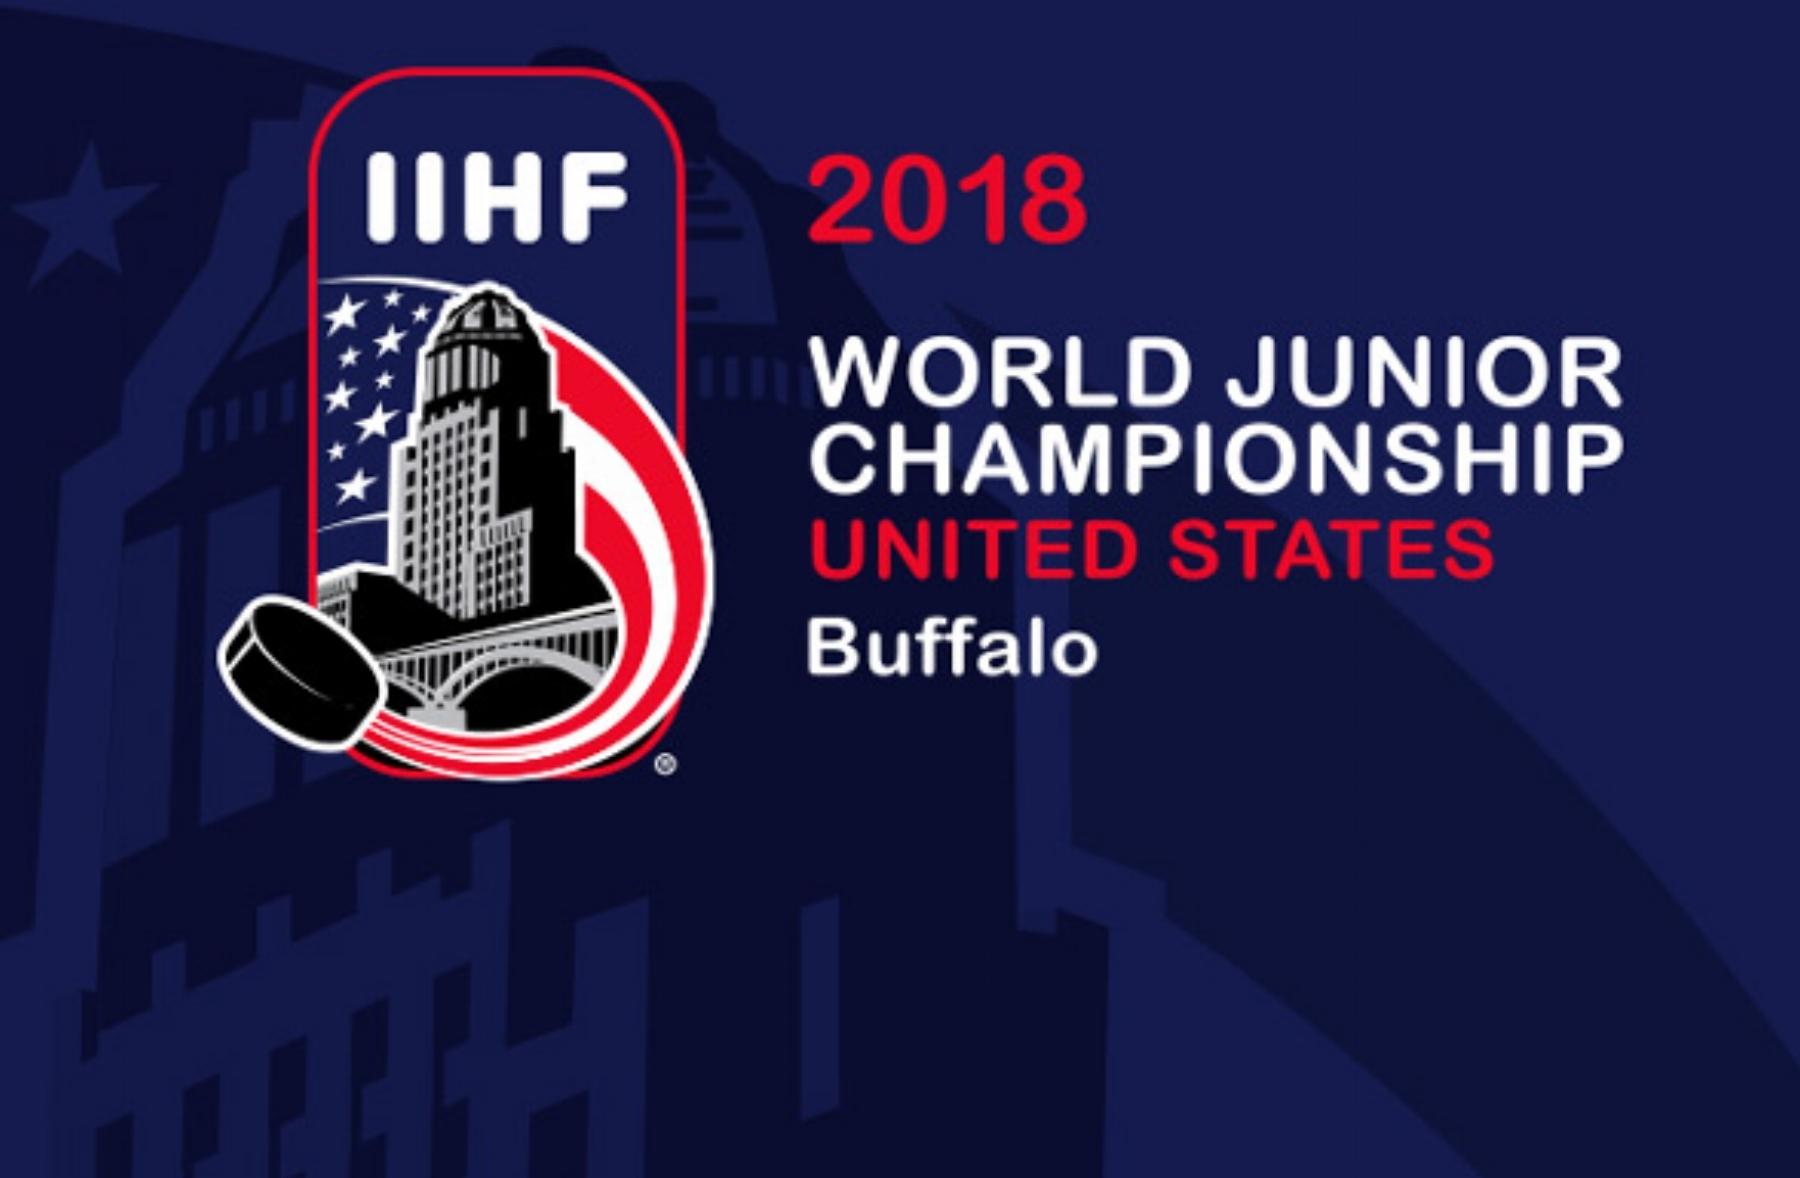 junior-world-championship-story-image.jpg